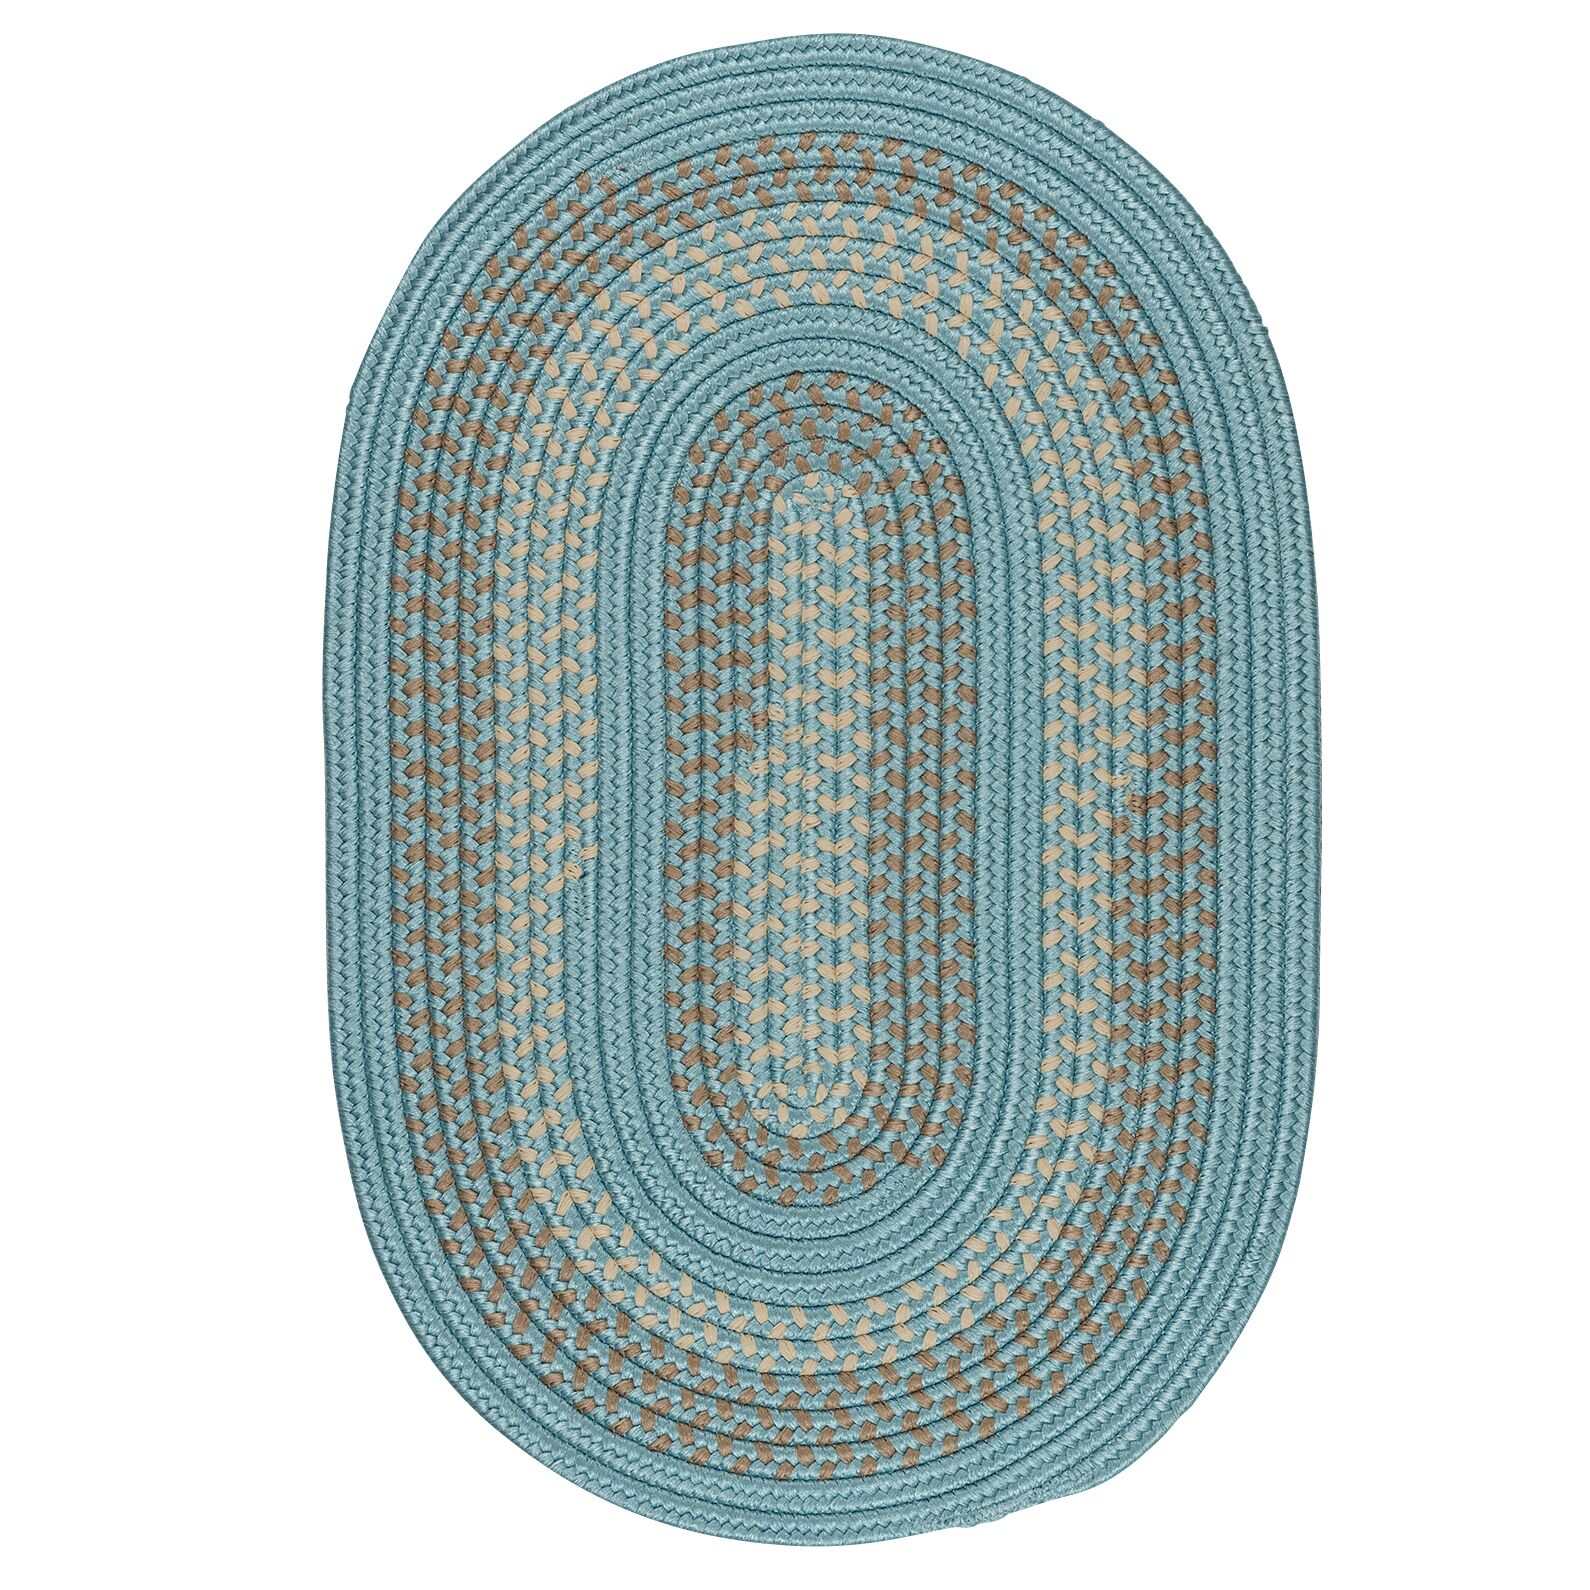 Knudtson Federal Blue Indoor/Outdoor Area Rug Rug Size: Runner 2' x 6'